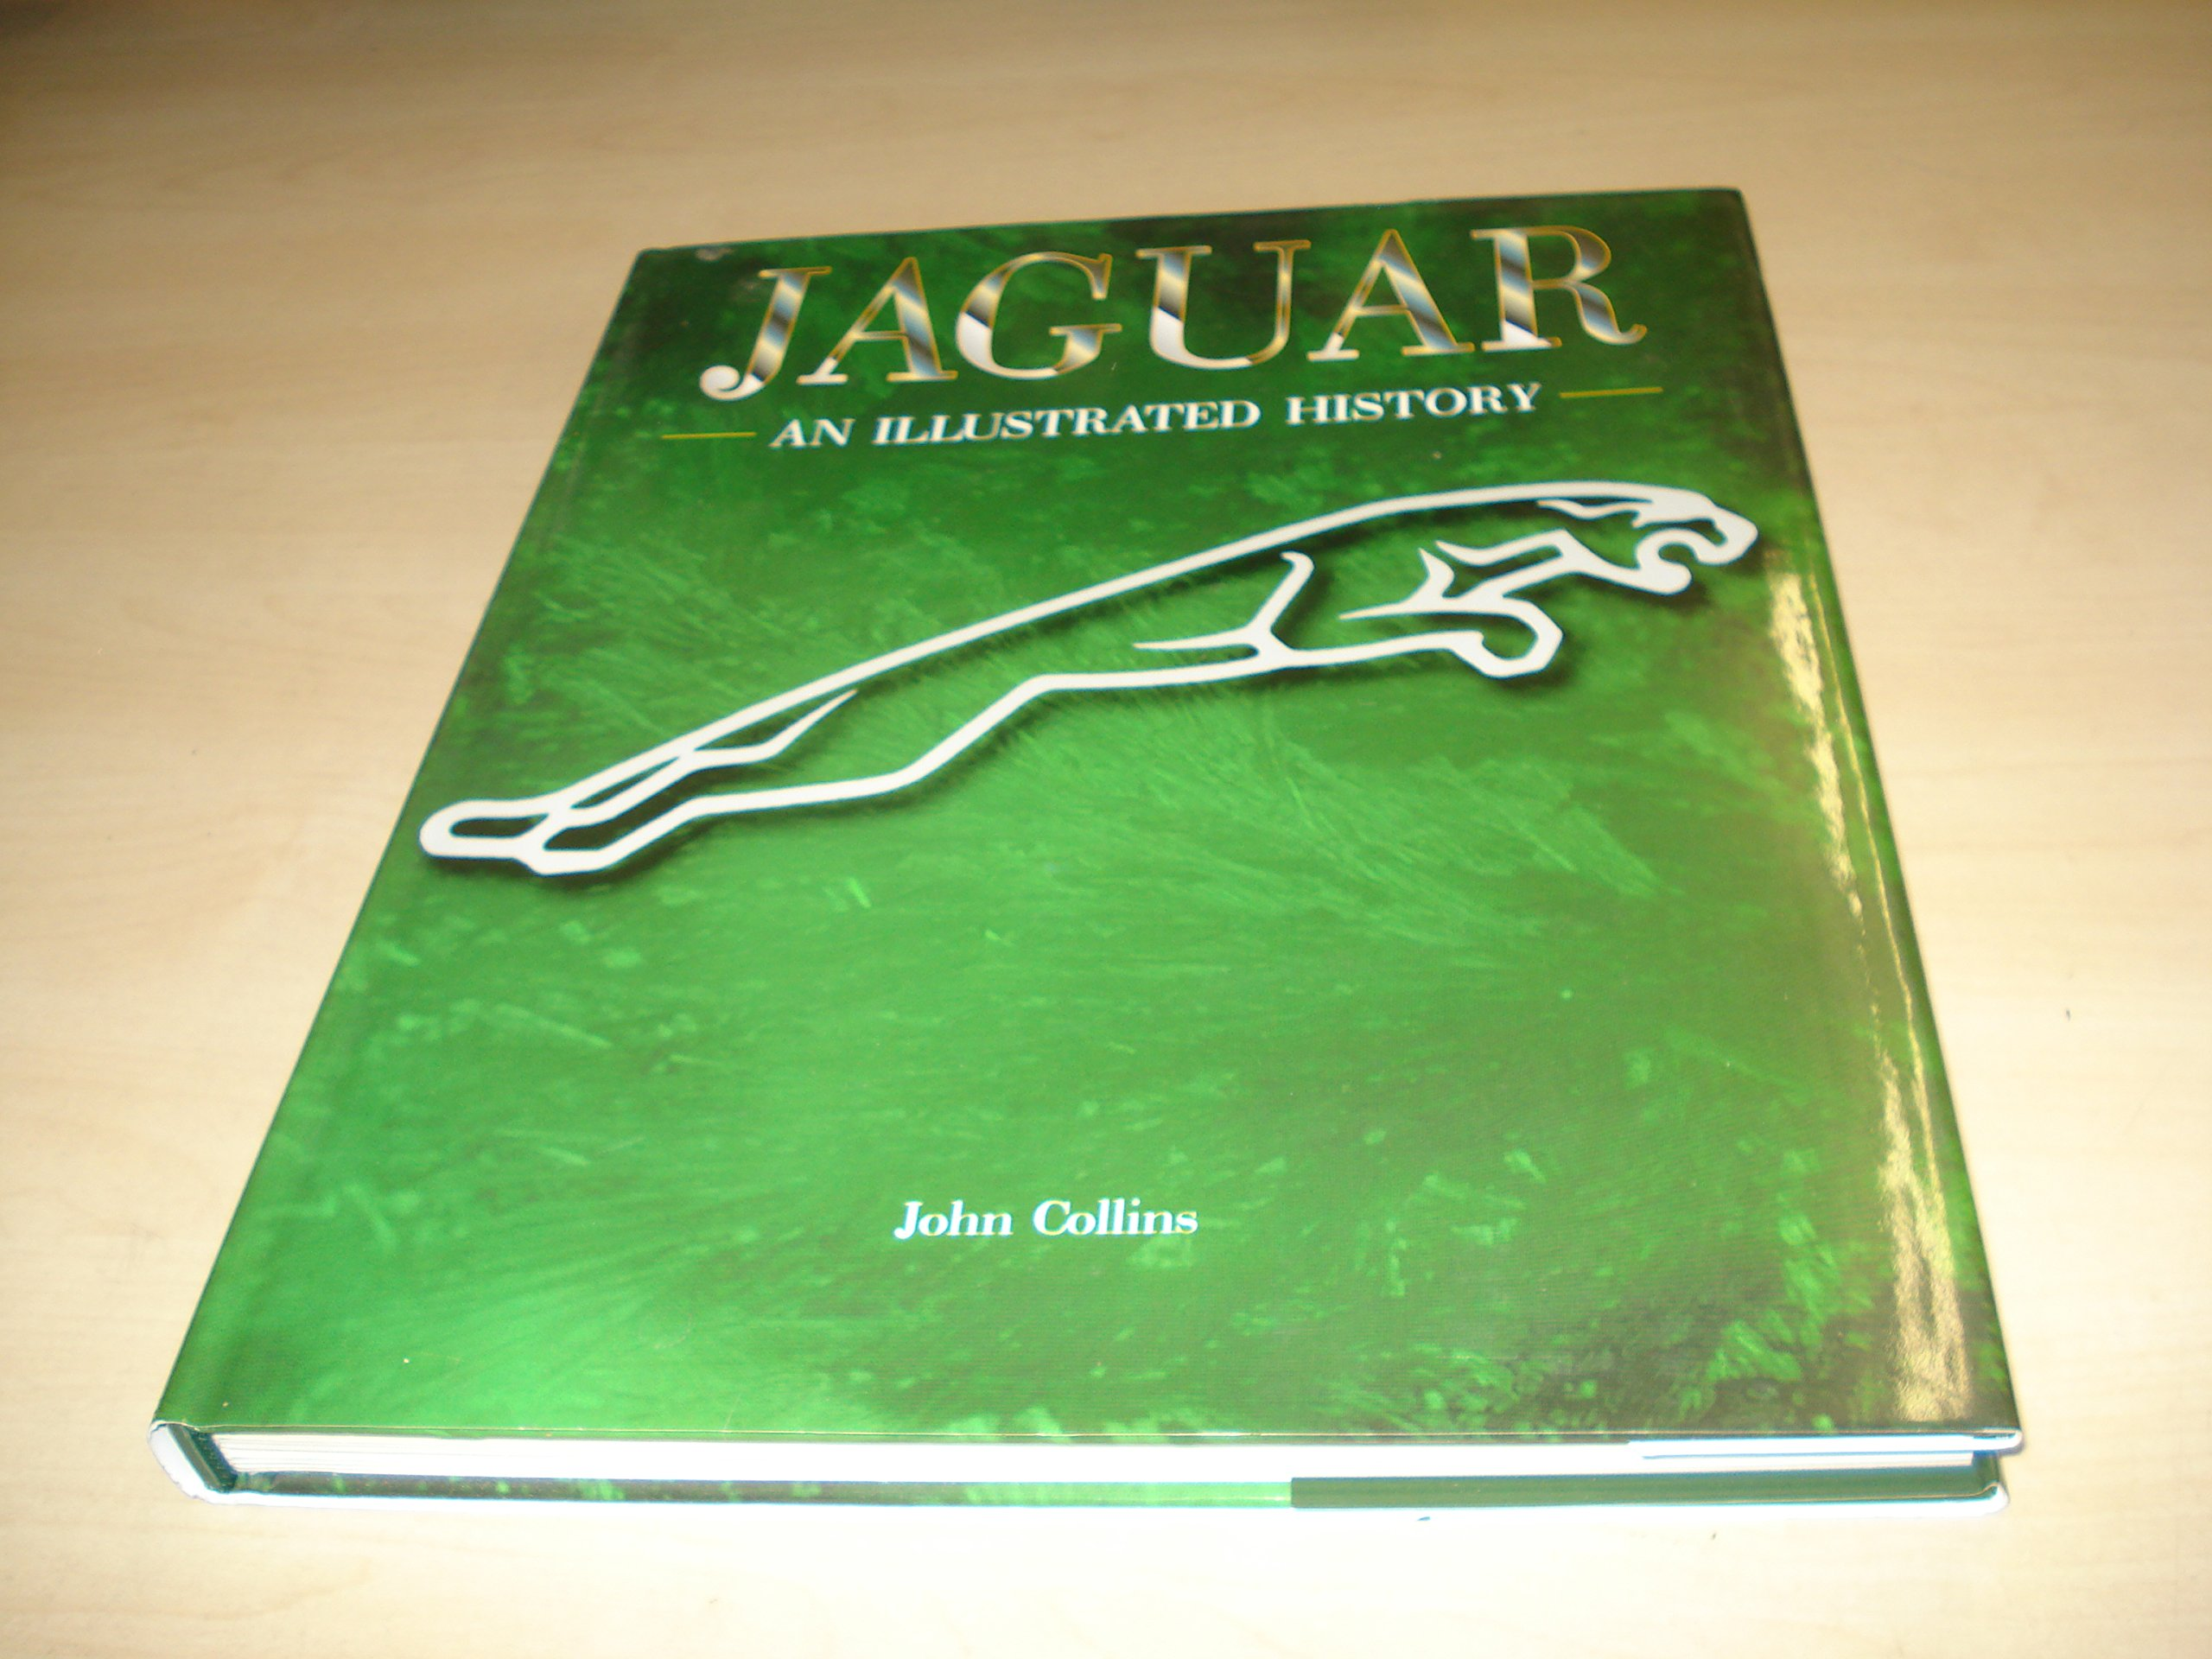 Jaguar : An Illustrated History